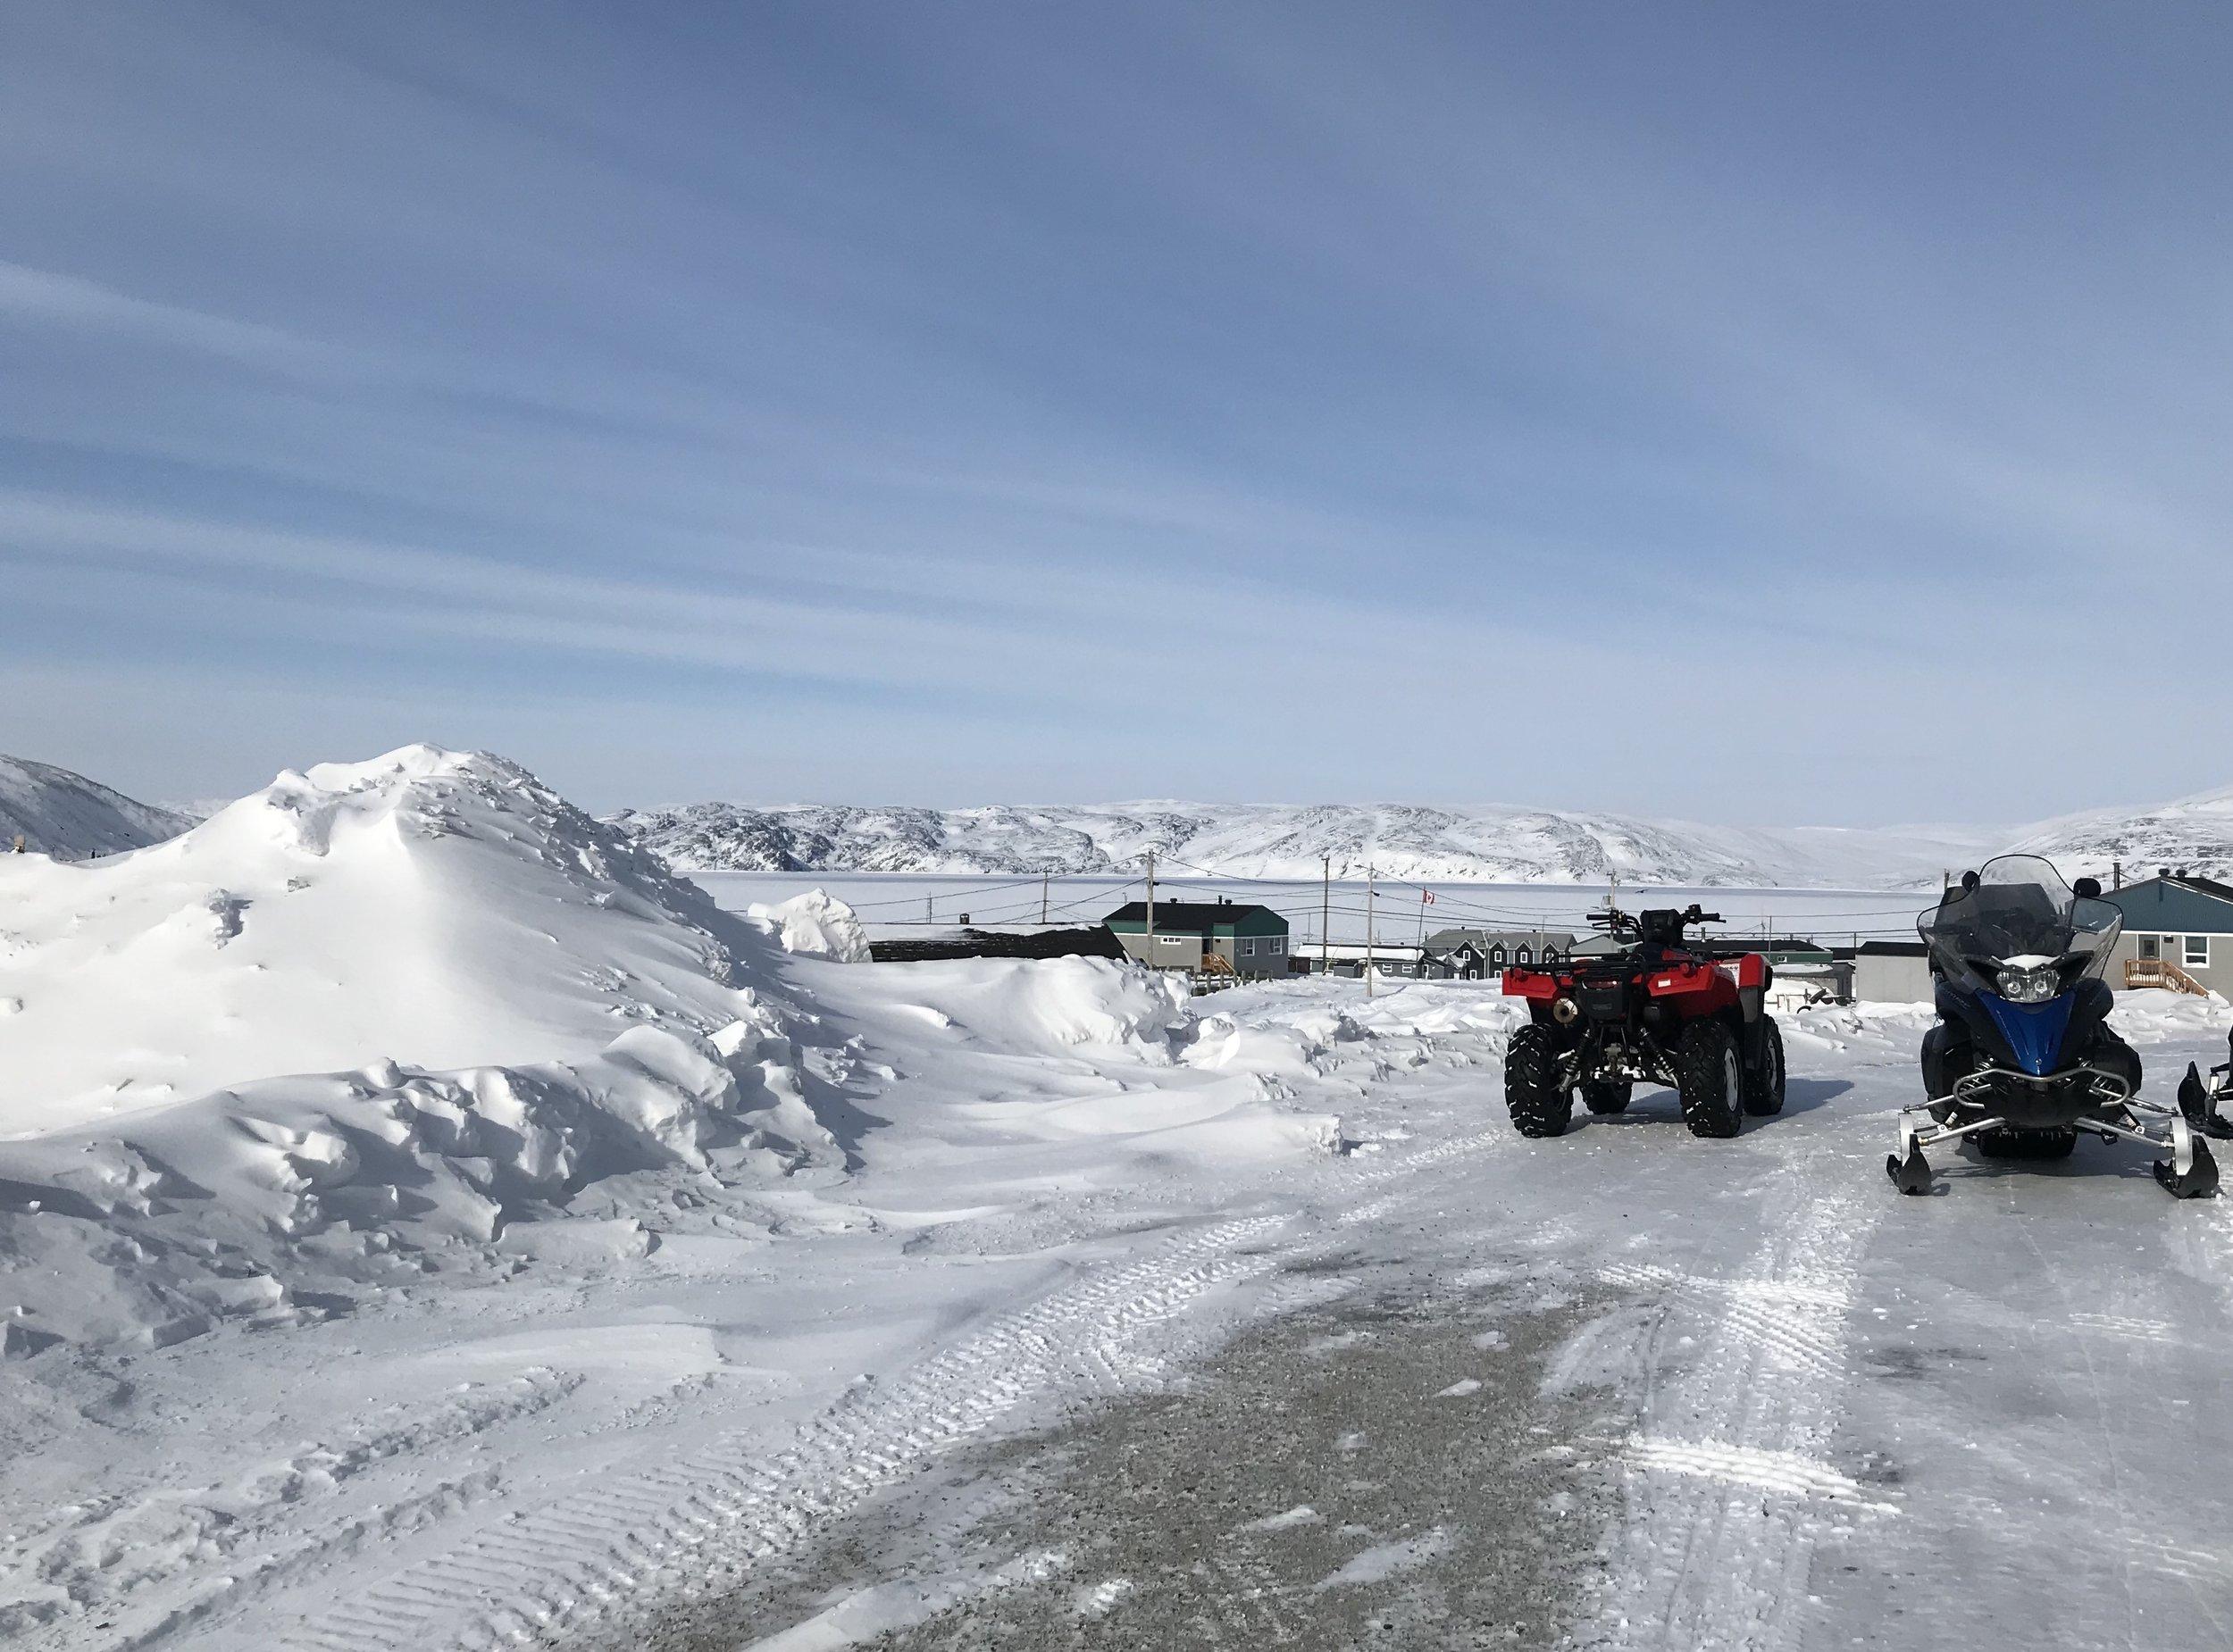 parking lot, Kangiqsujuaq style…